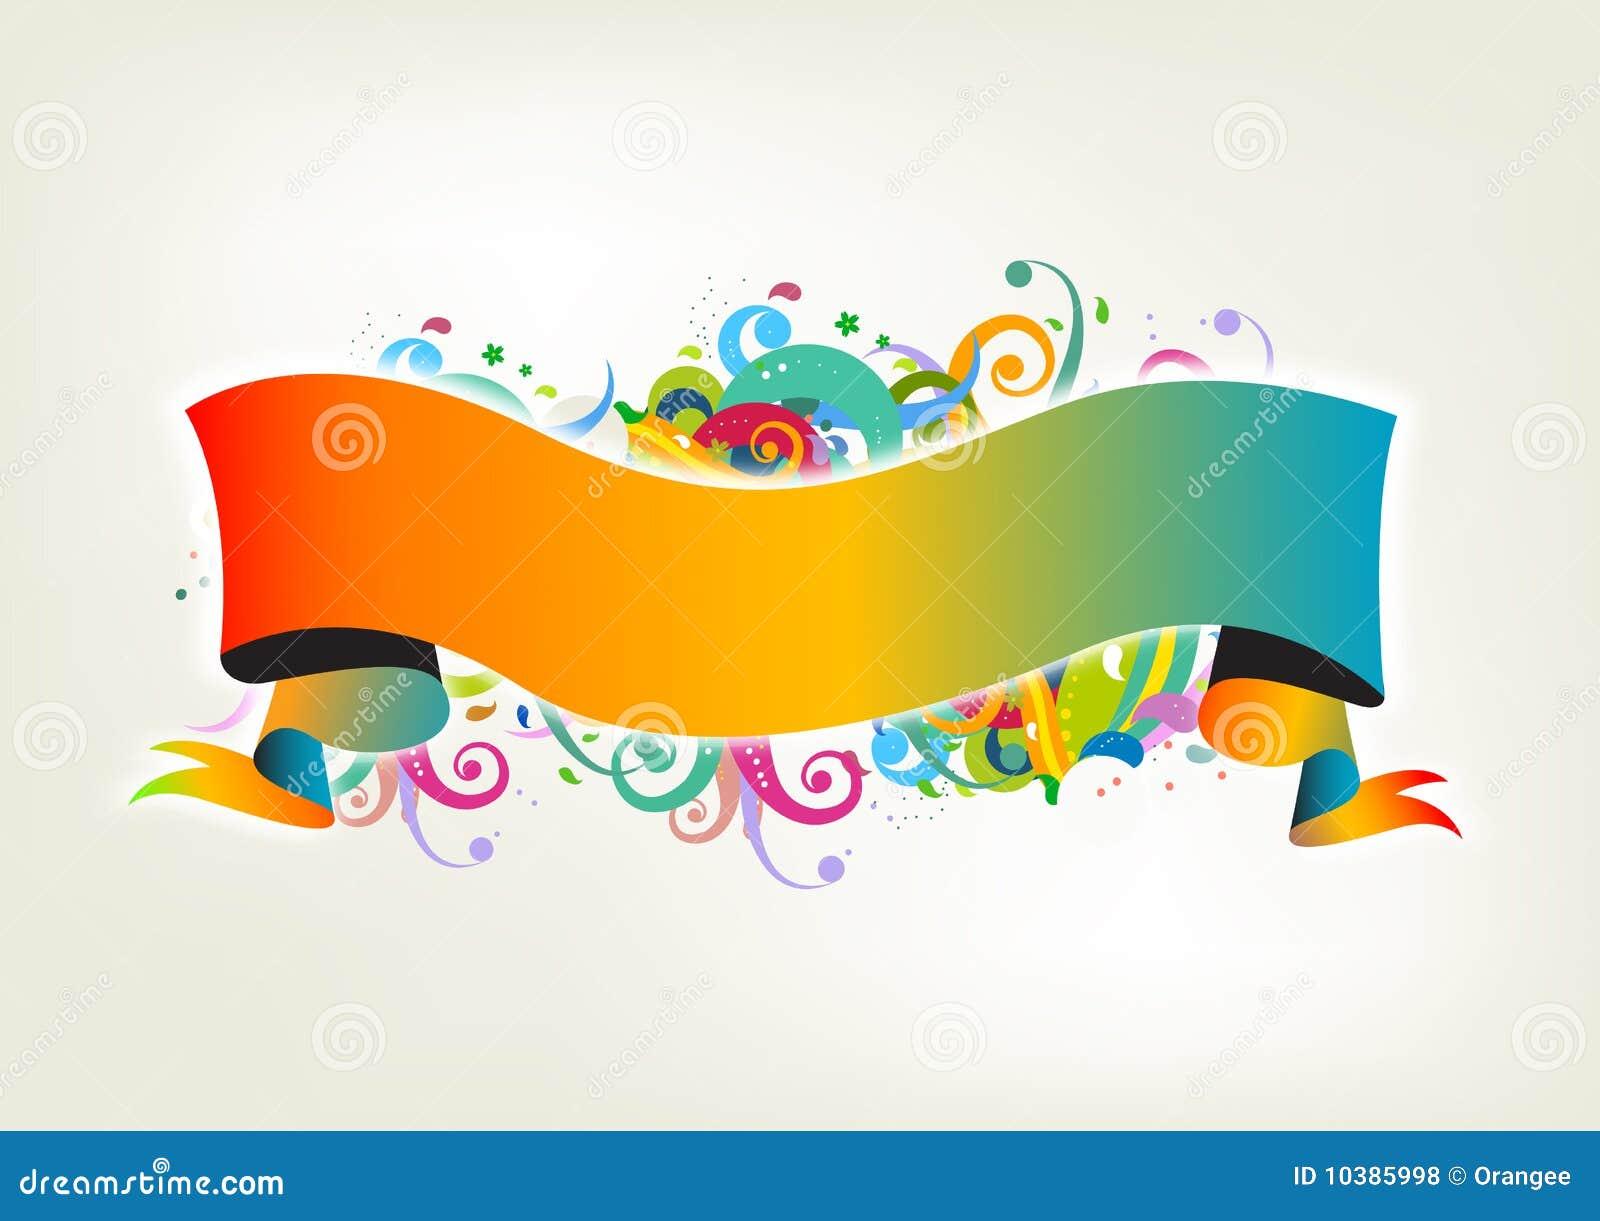 Colorfull banner